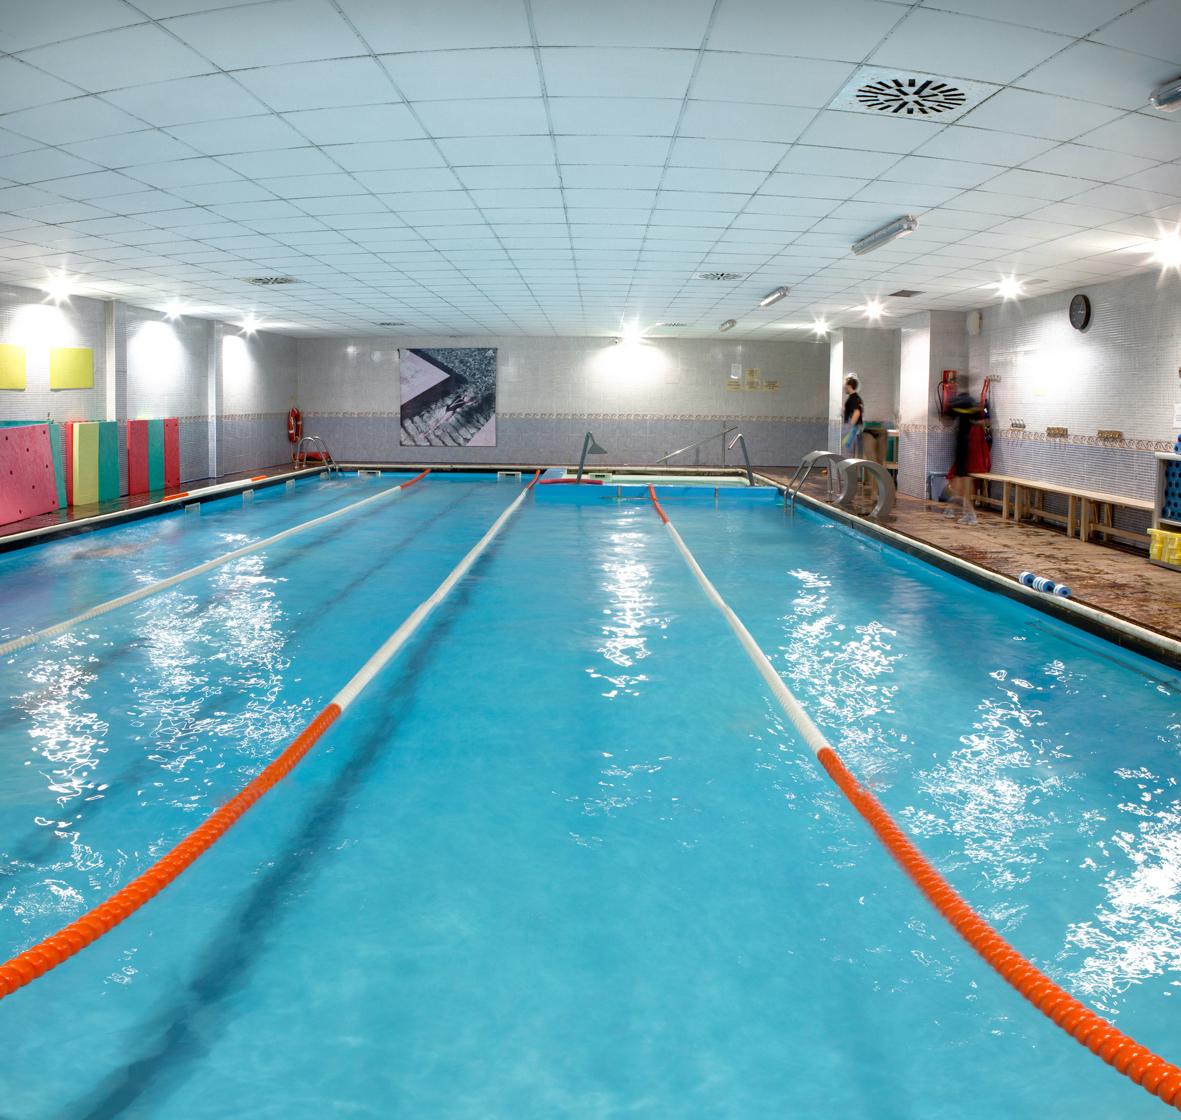 Galeria gimnasio zaragoza body factory for Gimnasio con piscina zaragoza